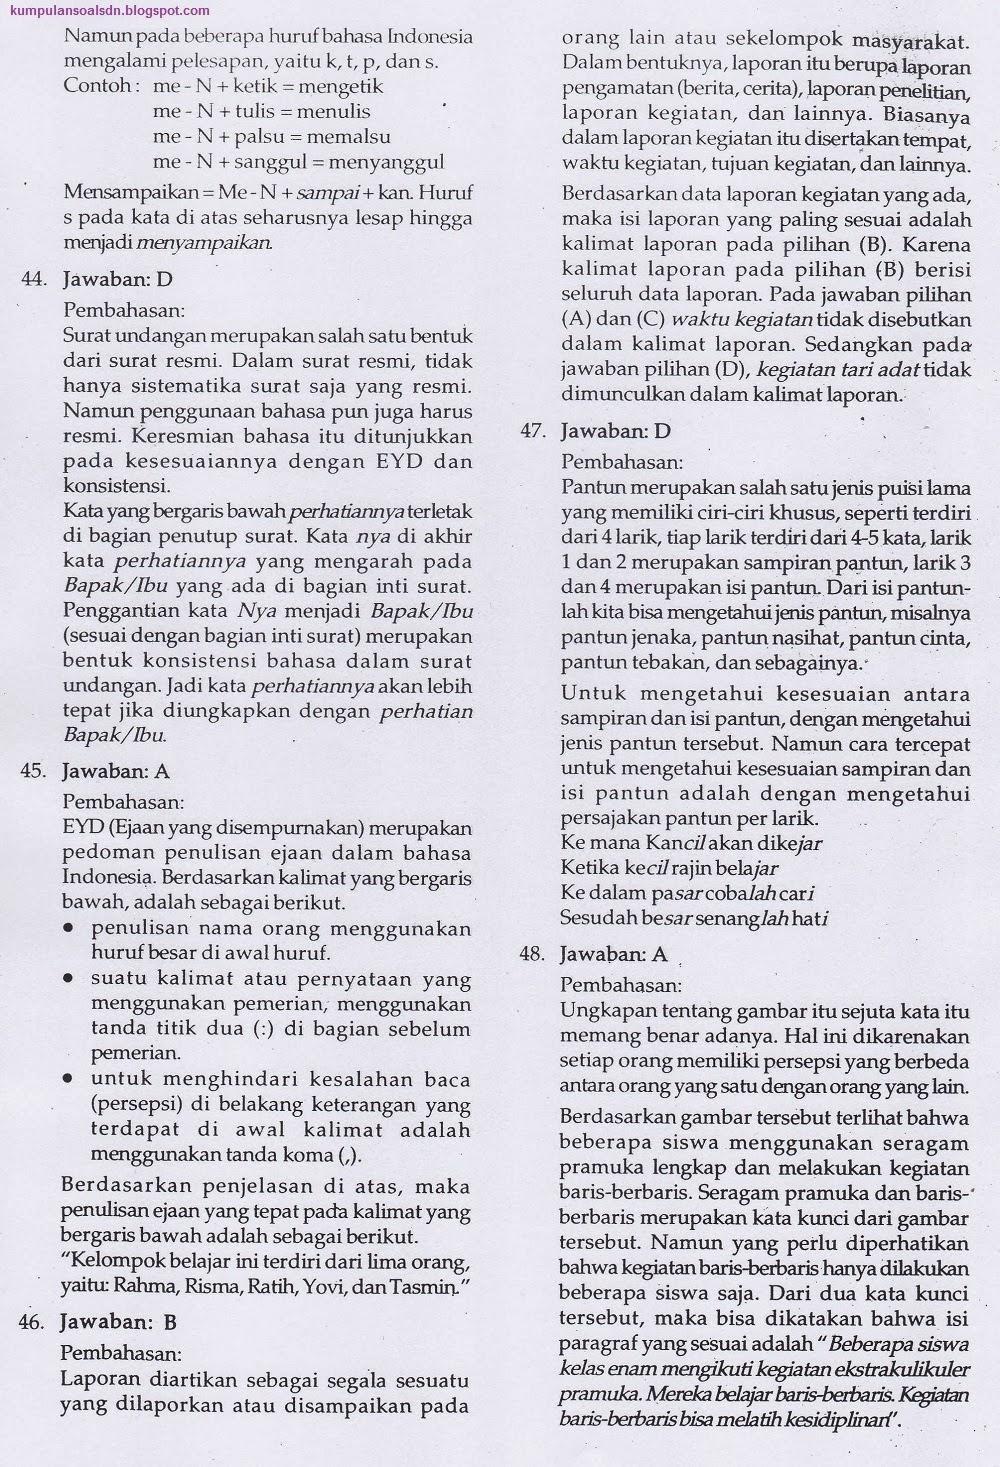 Pembahasan Soal Un Us Try Out Bahasa Indonesia Paket 3 Kelas 6 Vi Sd Ta 2011 2012 Kumpulan